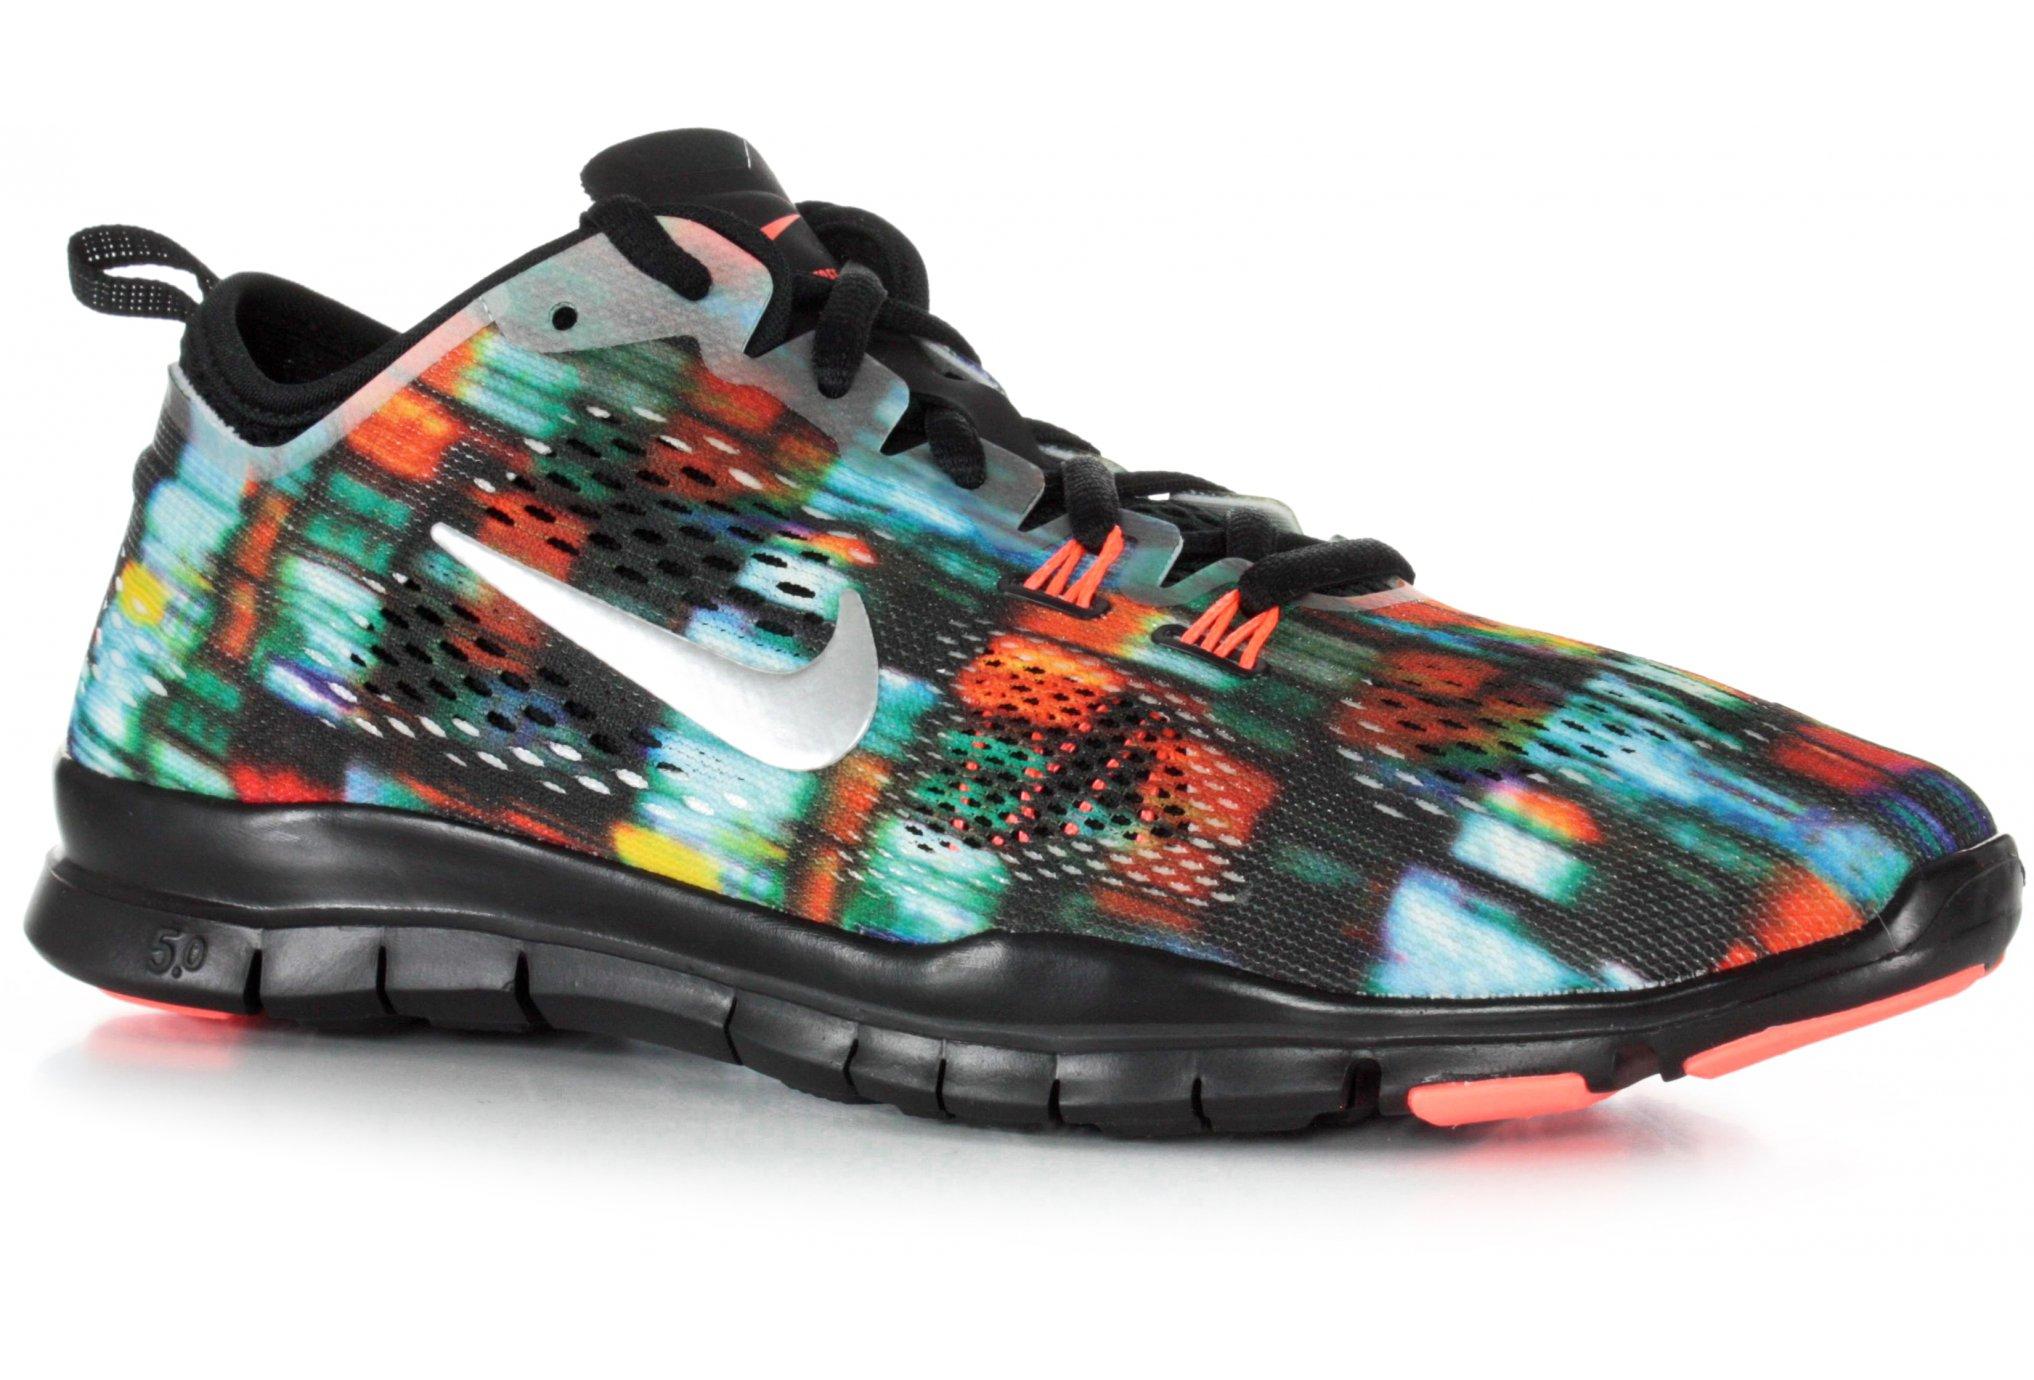 new style 26226 93986 Nike Free 5.0+ TR Fit 4 Print W femme Noir pas cher